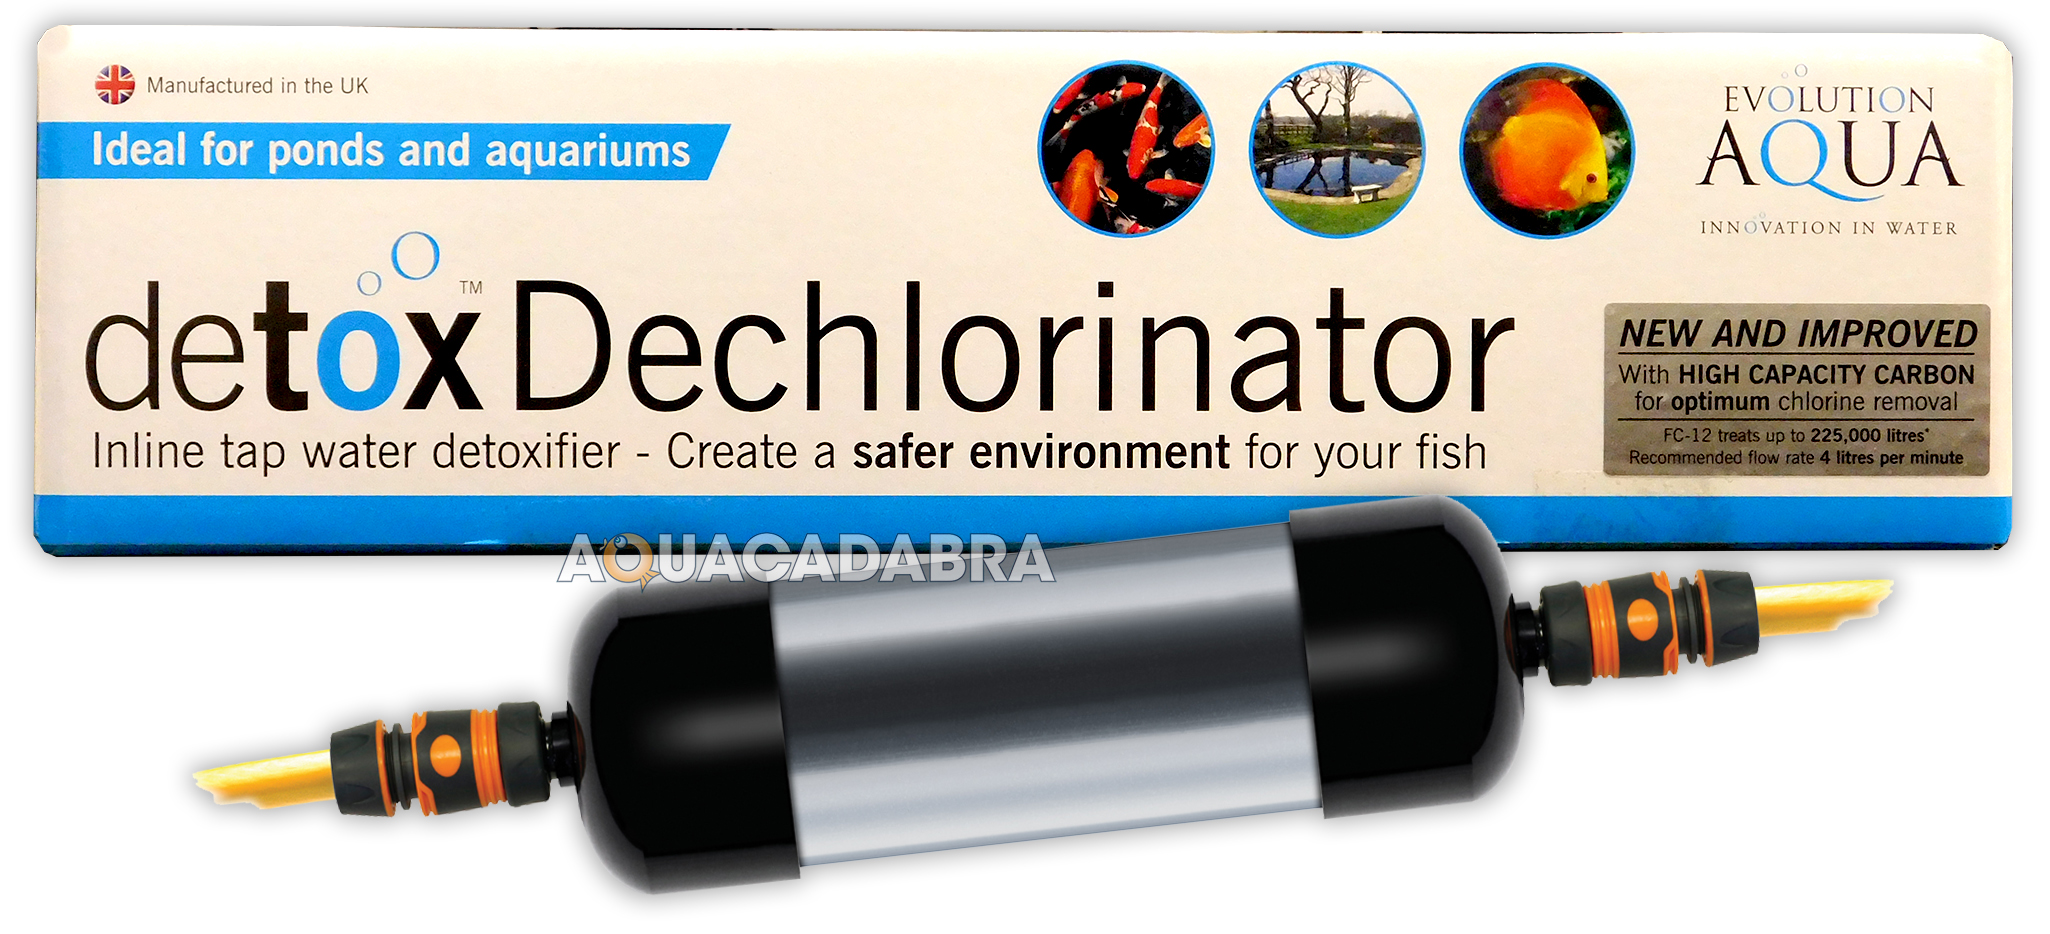 Evolution aqua detox dechlorinator carbon garden pond koi for Dechlorinator for koi ponds